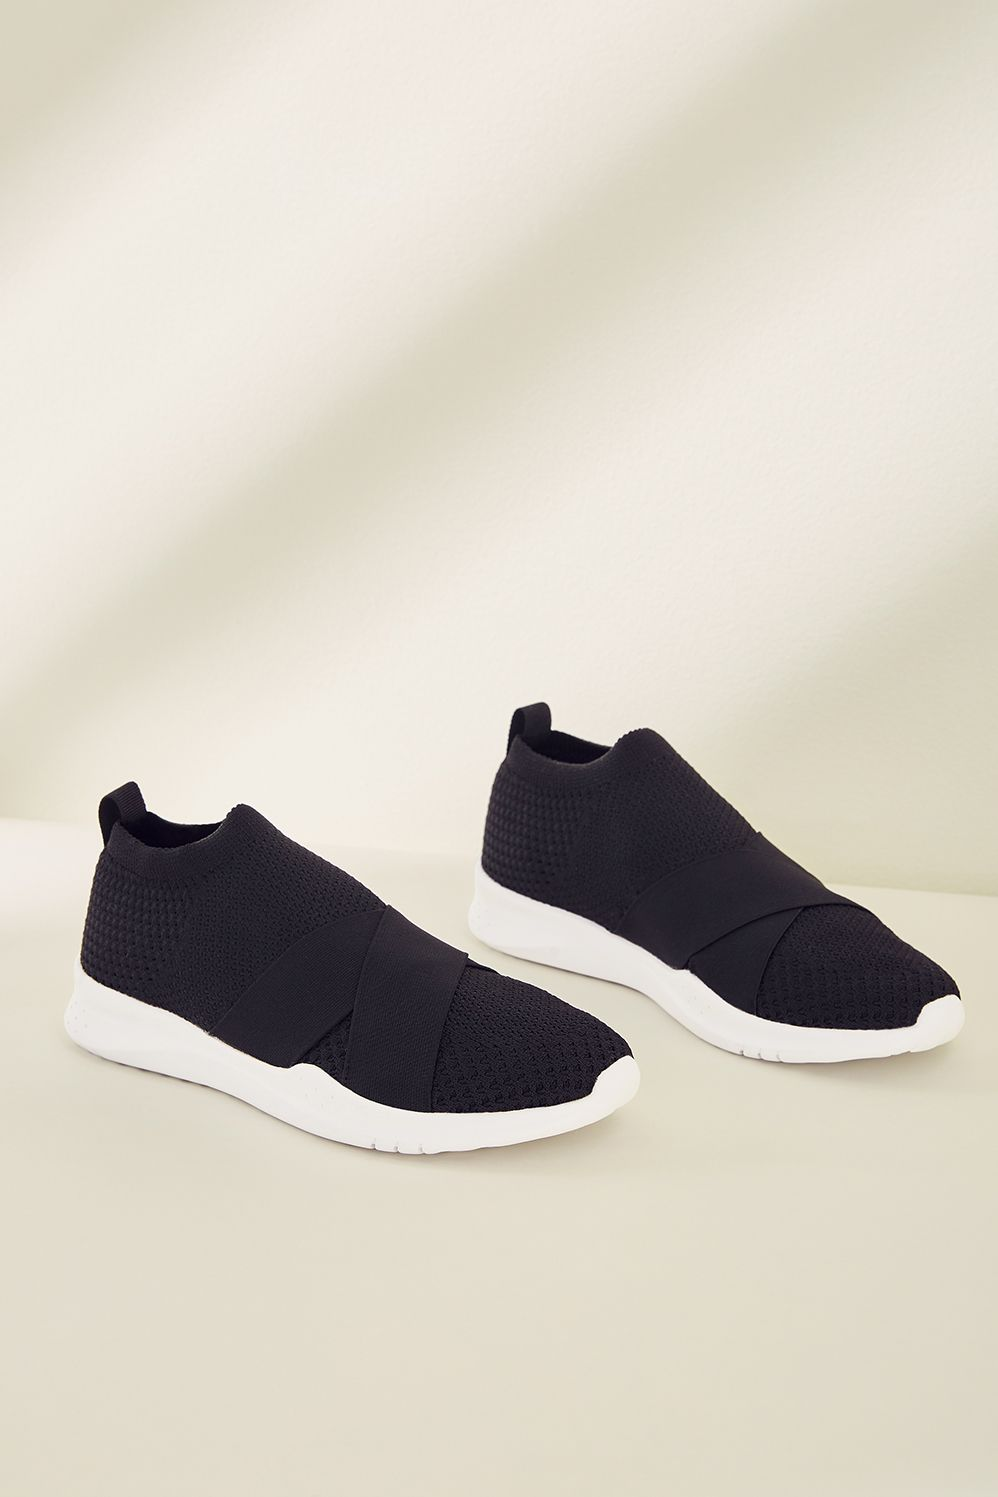 010362b488f78 Fabletics Fashion Cardiff Strap Sneaker Womens Black White Size 11 ...